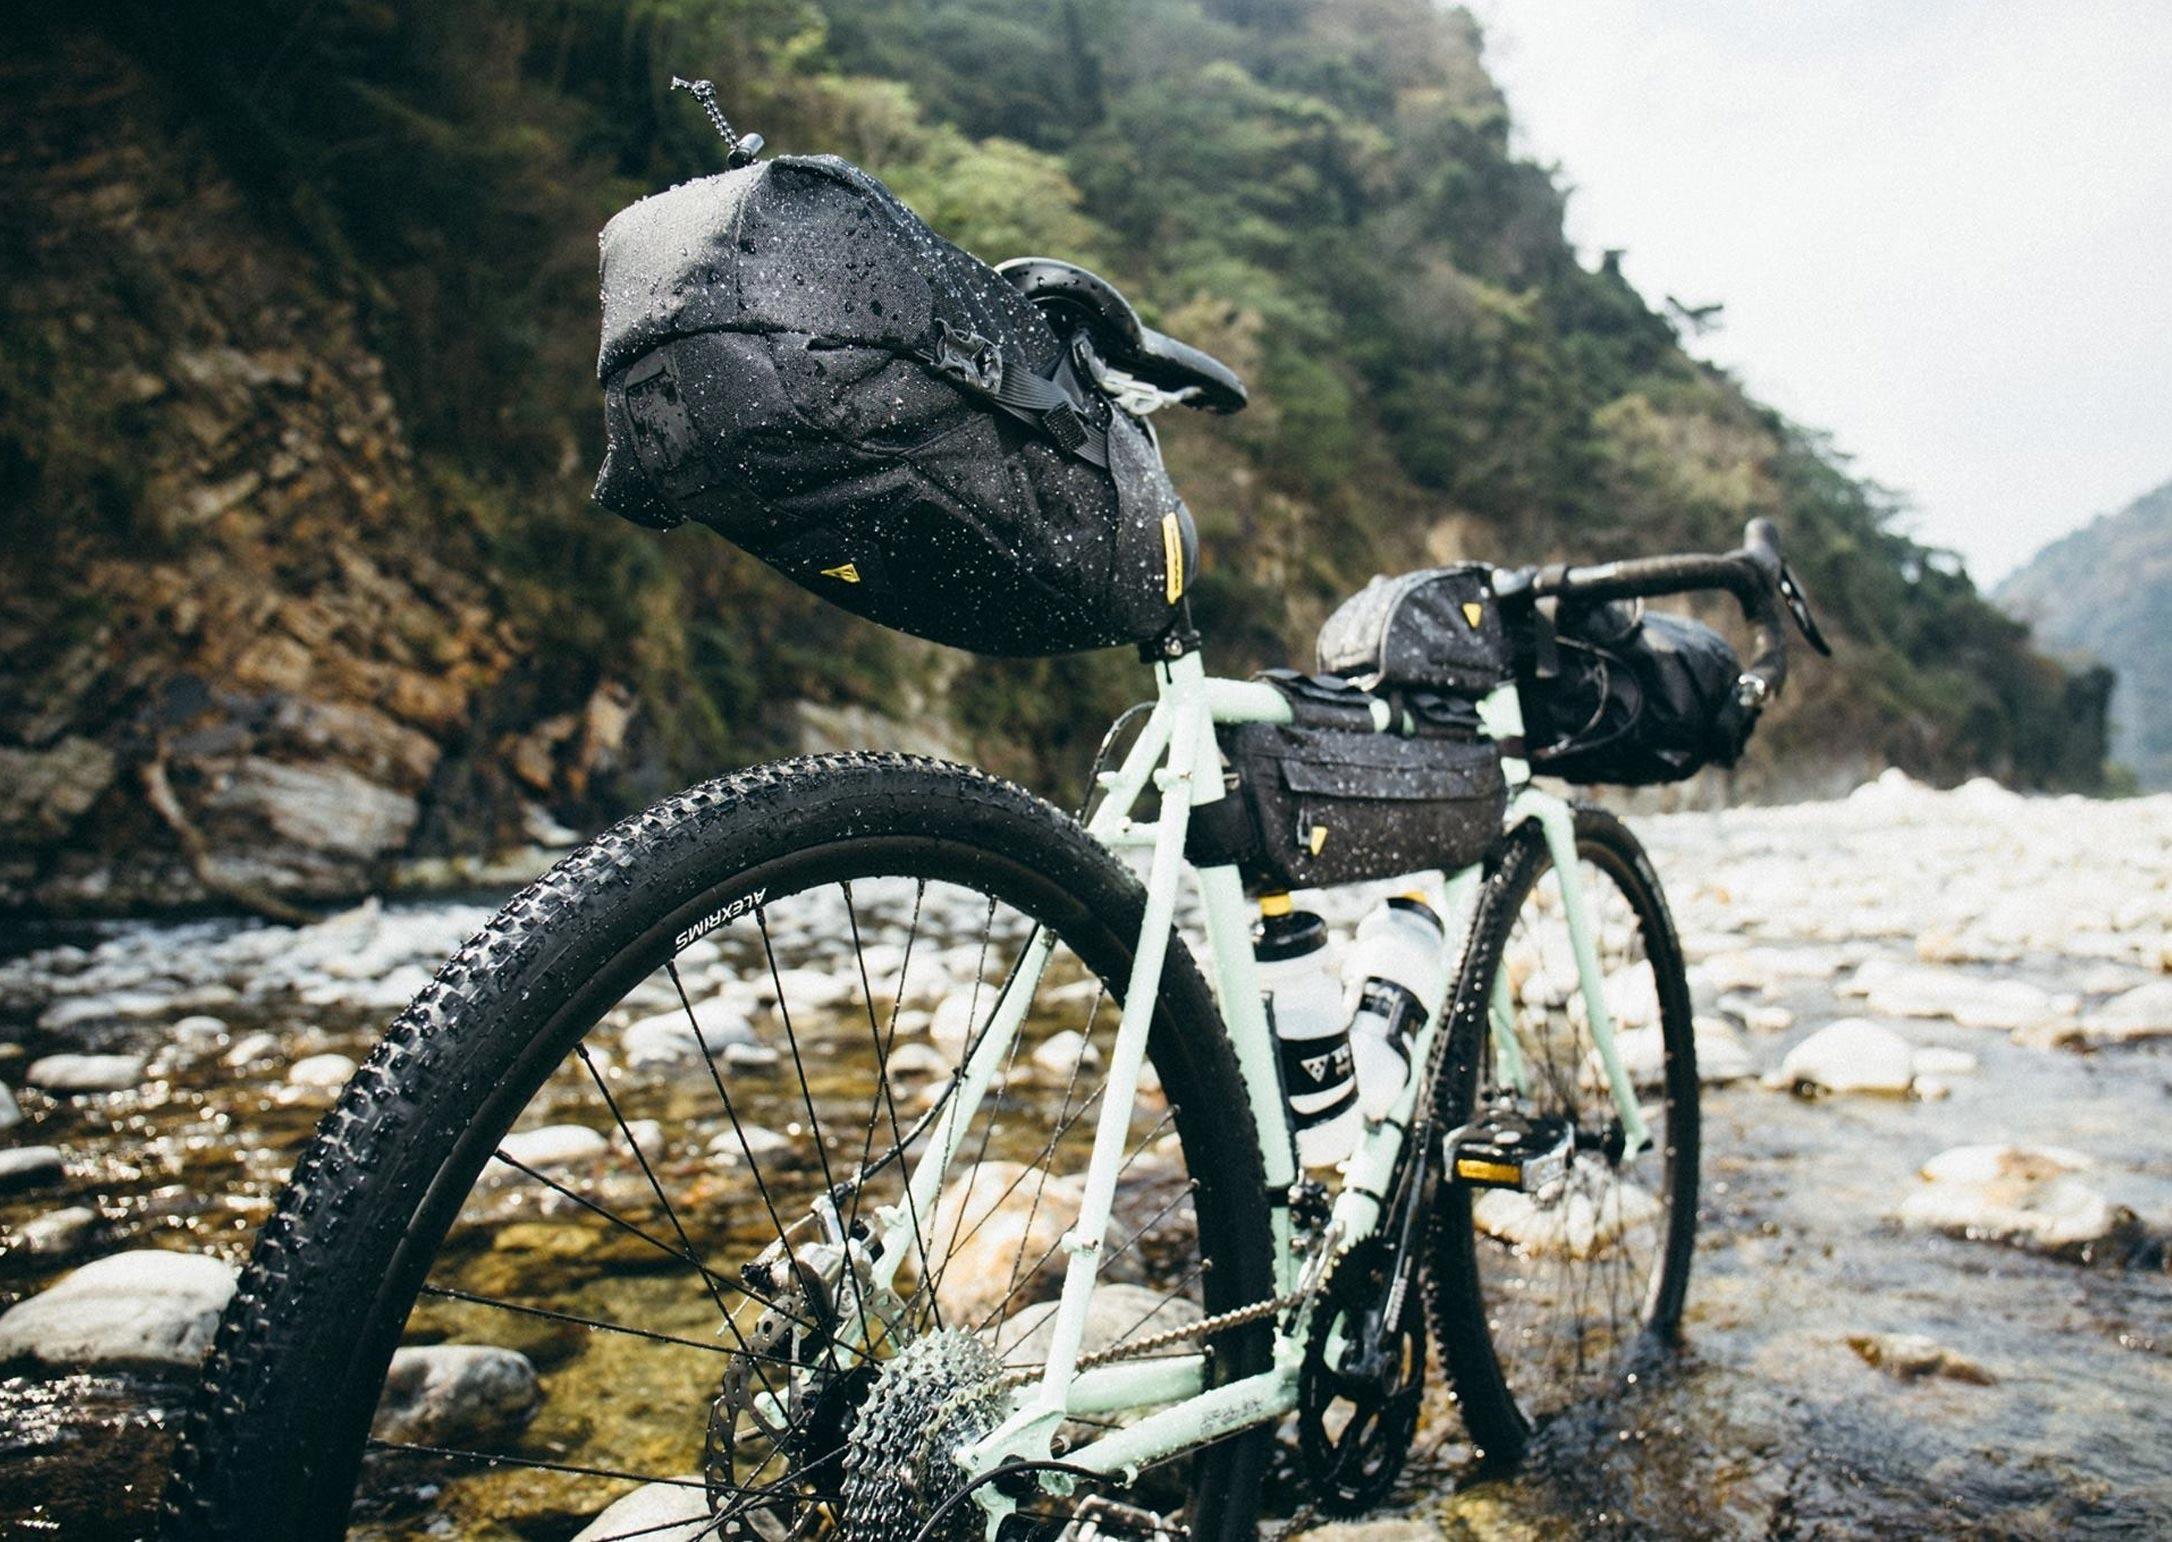 bike-bag-luggage-pannier-ortlieb-tou[3]